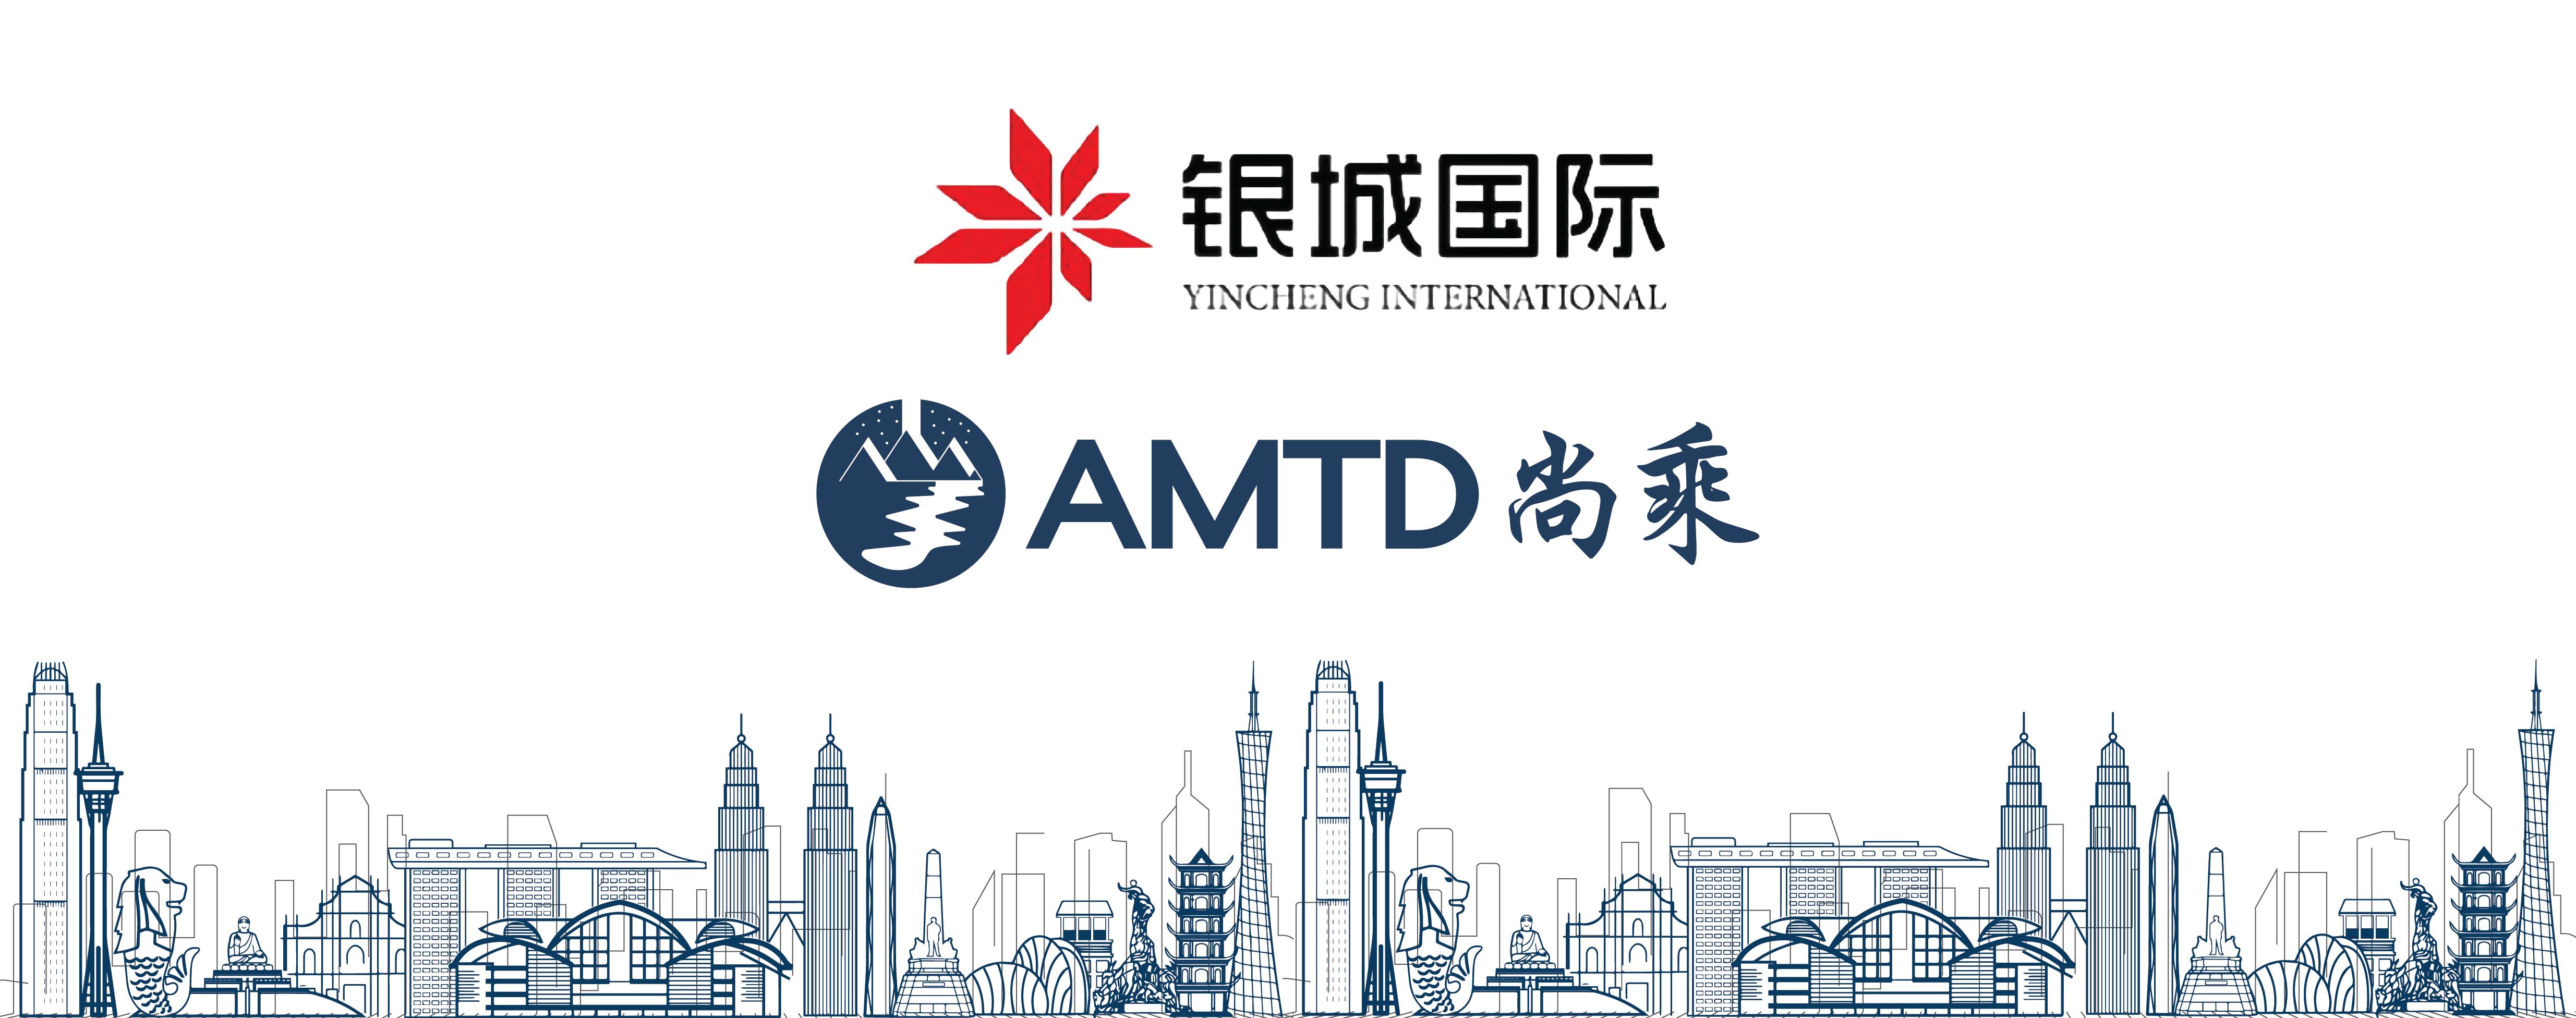 AMTD Deals   Yincheng Int'l US$165m 11.800% 364-Day Senior Bond Offering